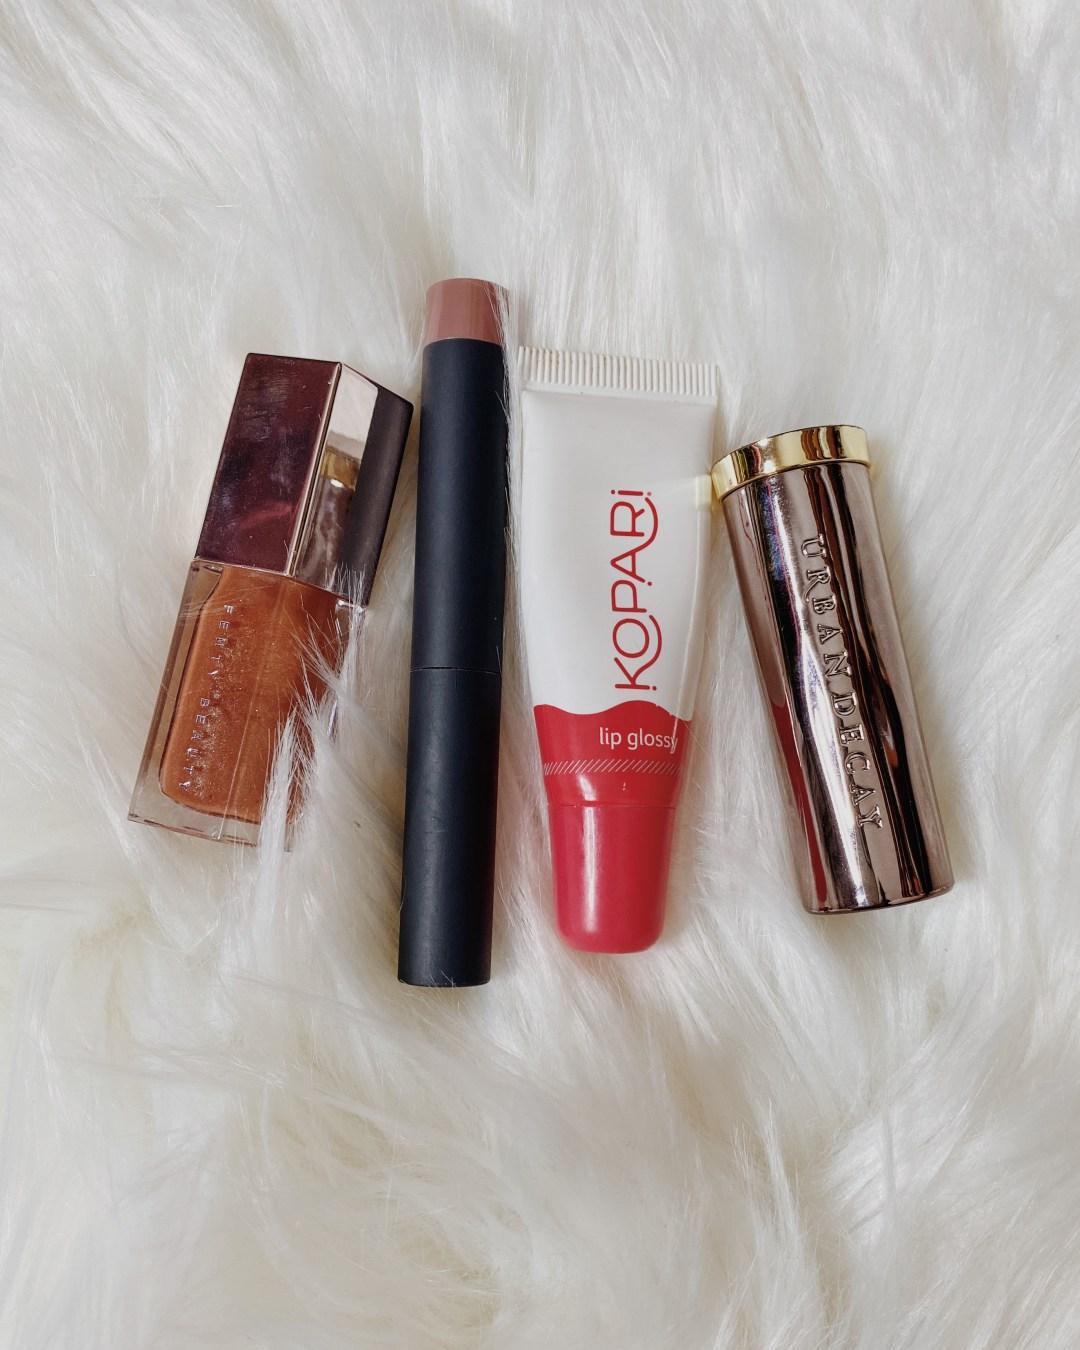 20 in 2020 Project Pan Introduction   Lip Products   Fenty Beauty Gloss Bomb   Bite Beauty Glace   Kopari Coconut Lip Glossy   Urban Decay Liar Vice Lipstick